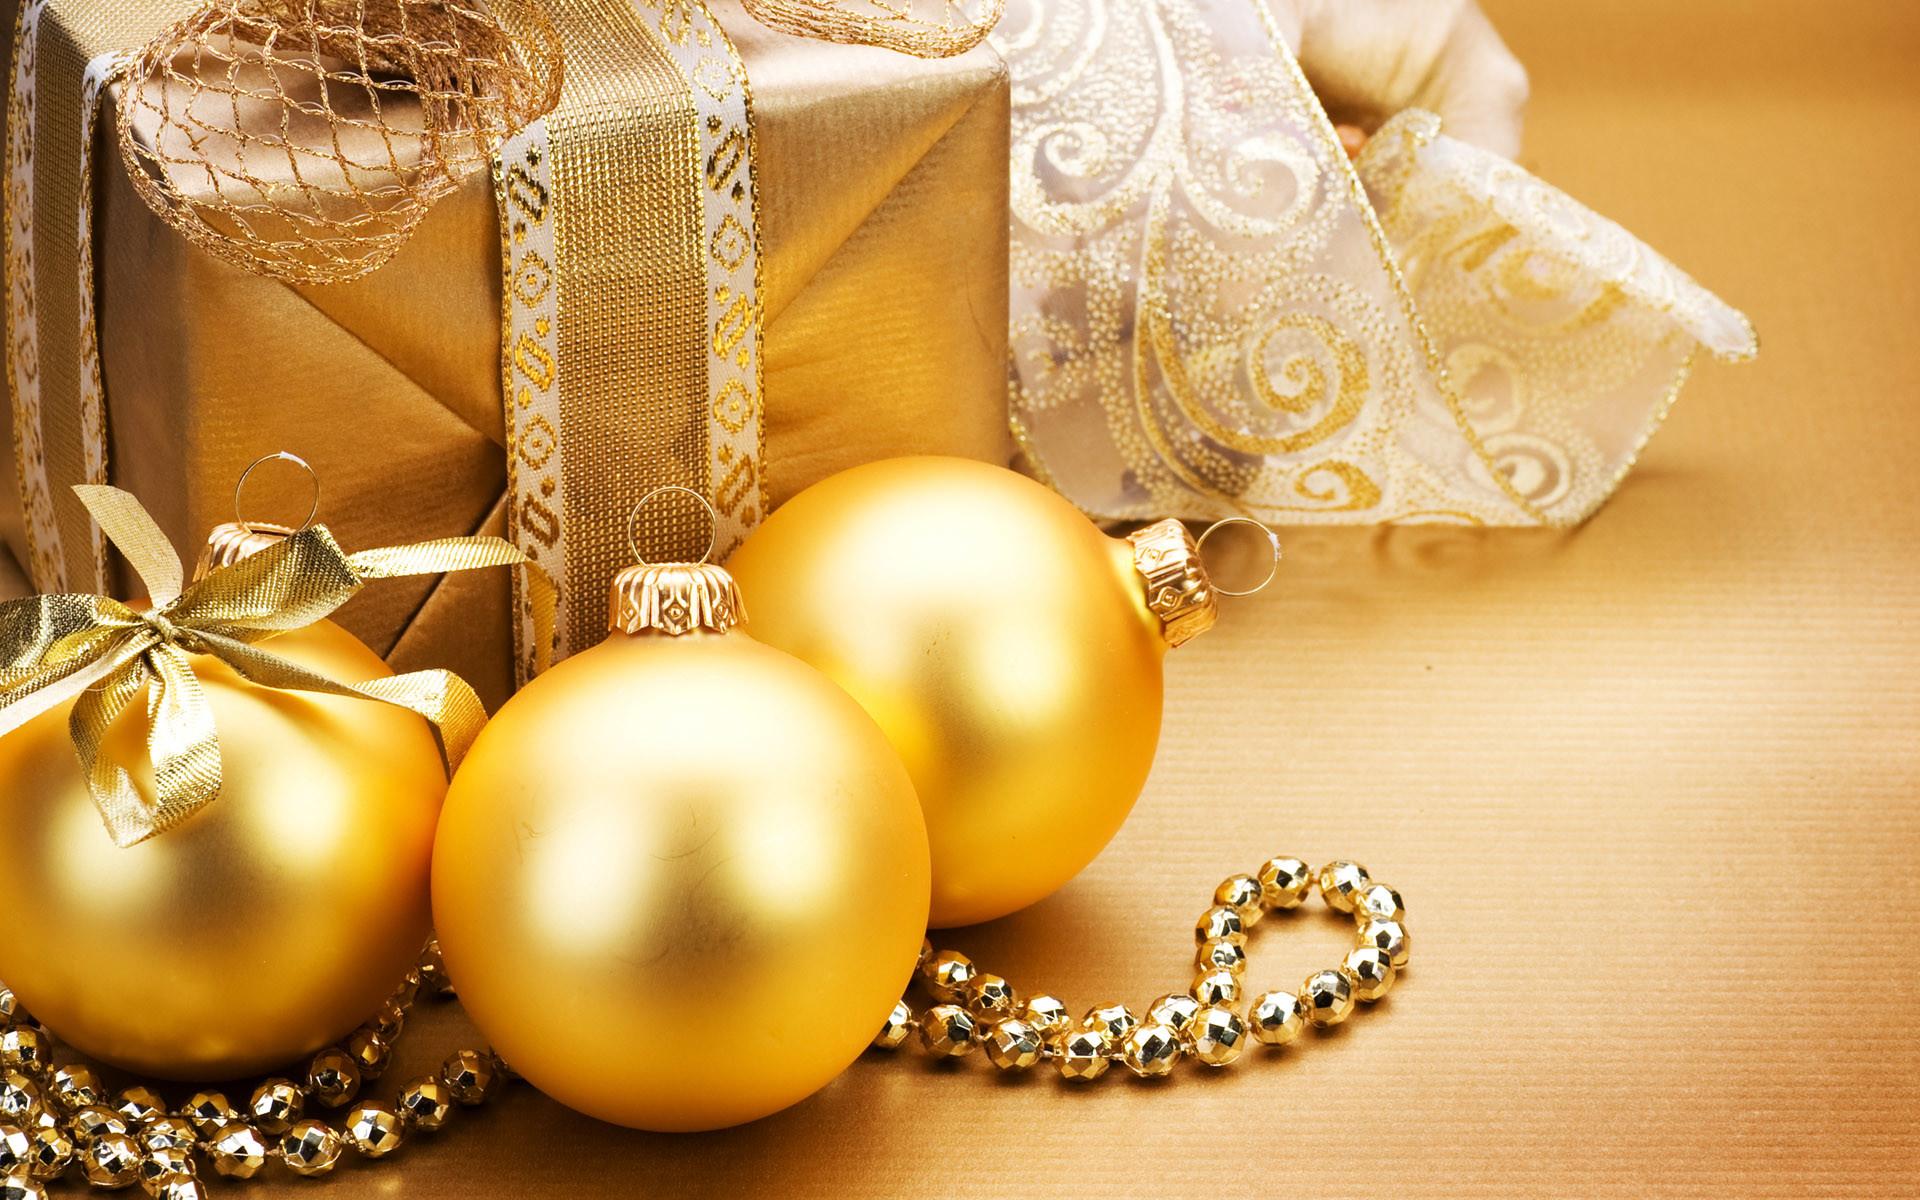 golden_christmas_balls_and_gifts_001011 · Golden Christmas